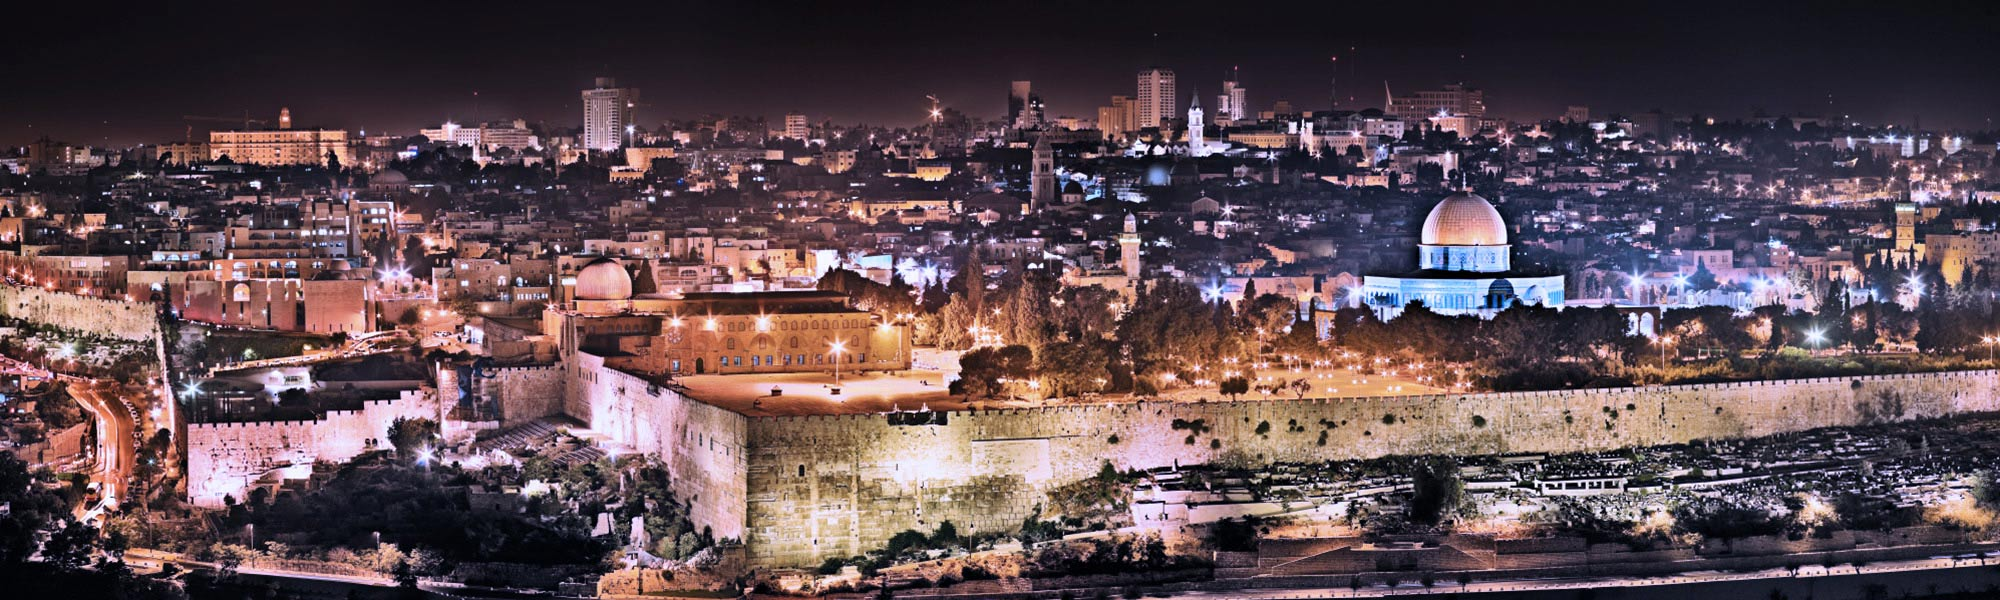 אתר ועידת ישראל לעסקים 2018 / צילום:Shutterstock/ א.ס.א.פ קרייטיב